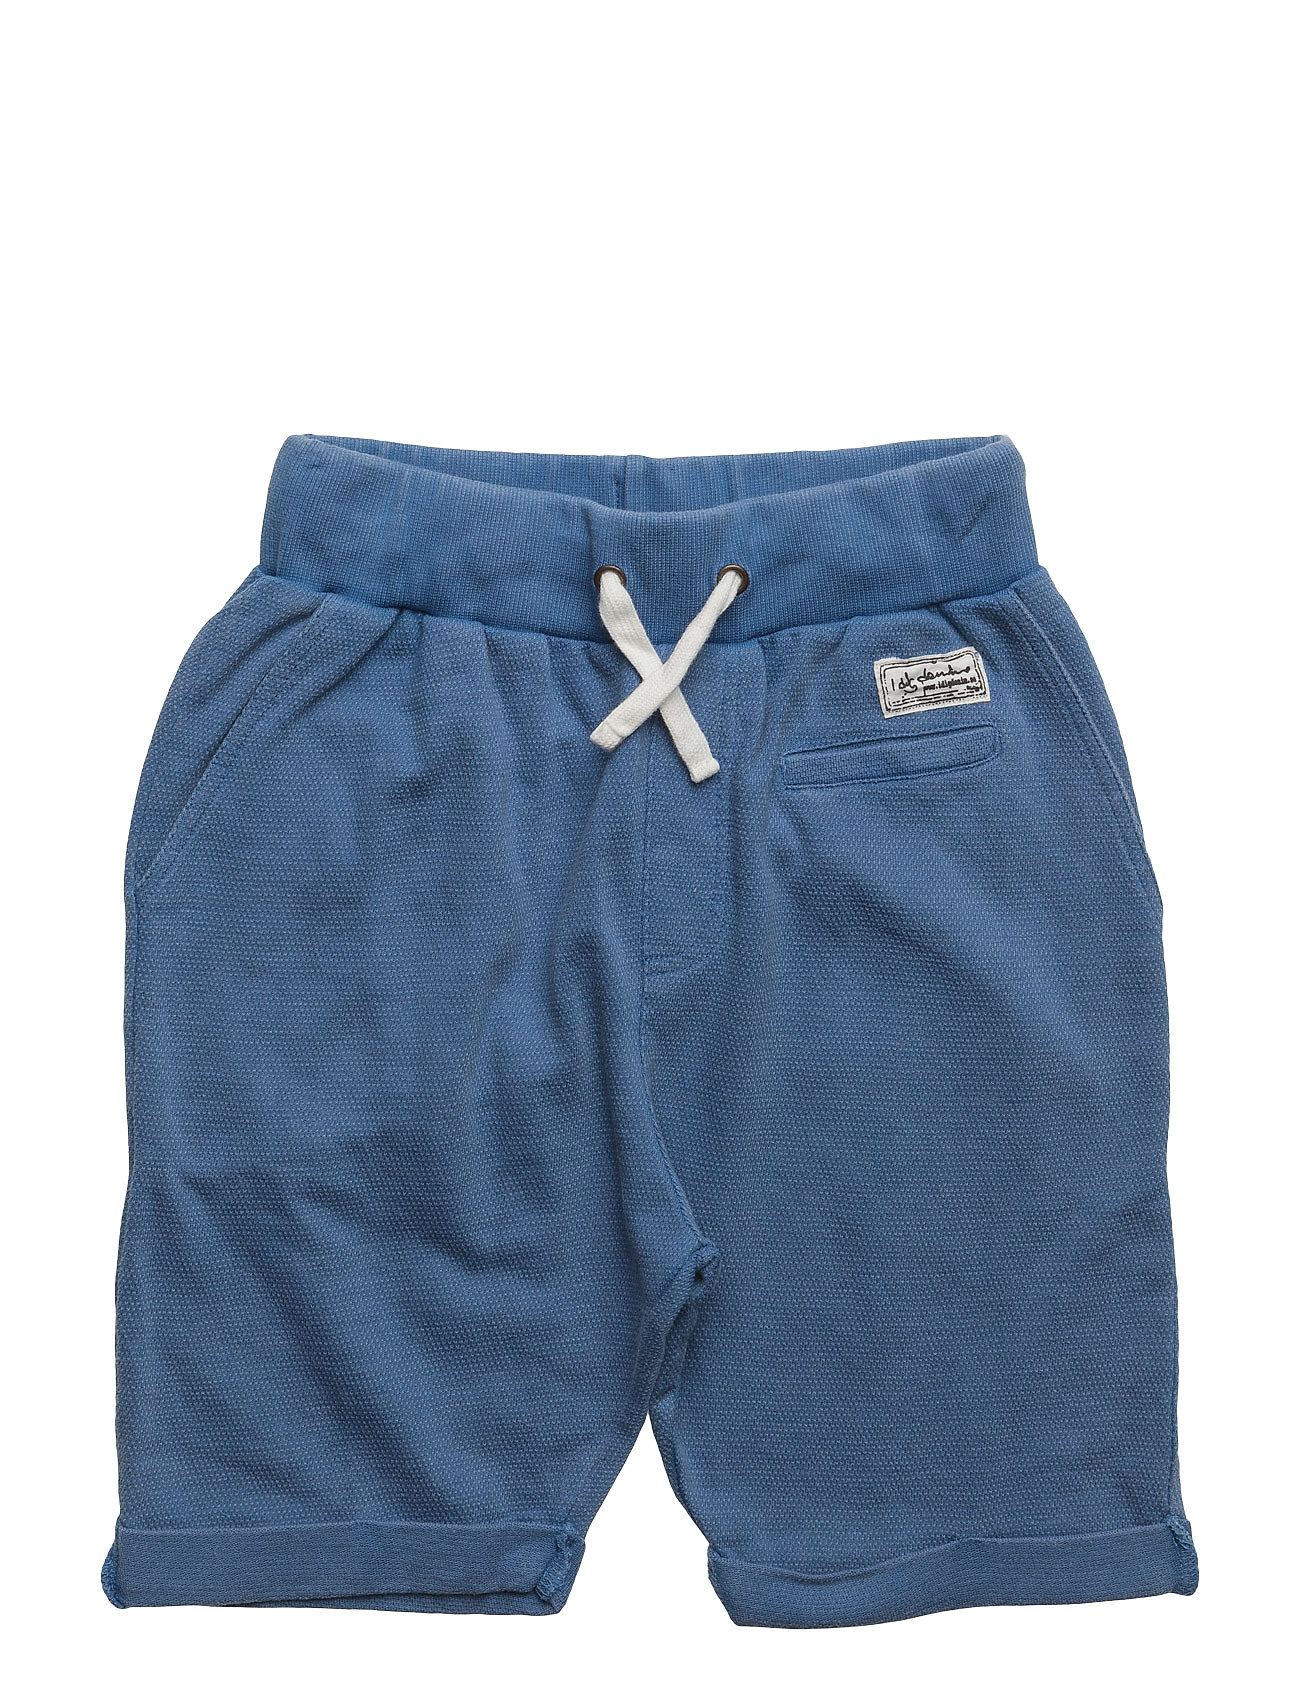 Trey Shorts I dig denim Shorts til Børn i indigo